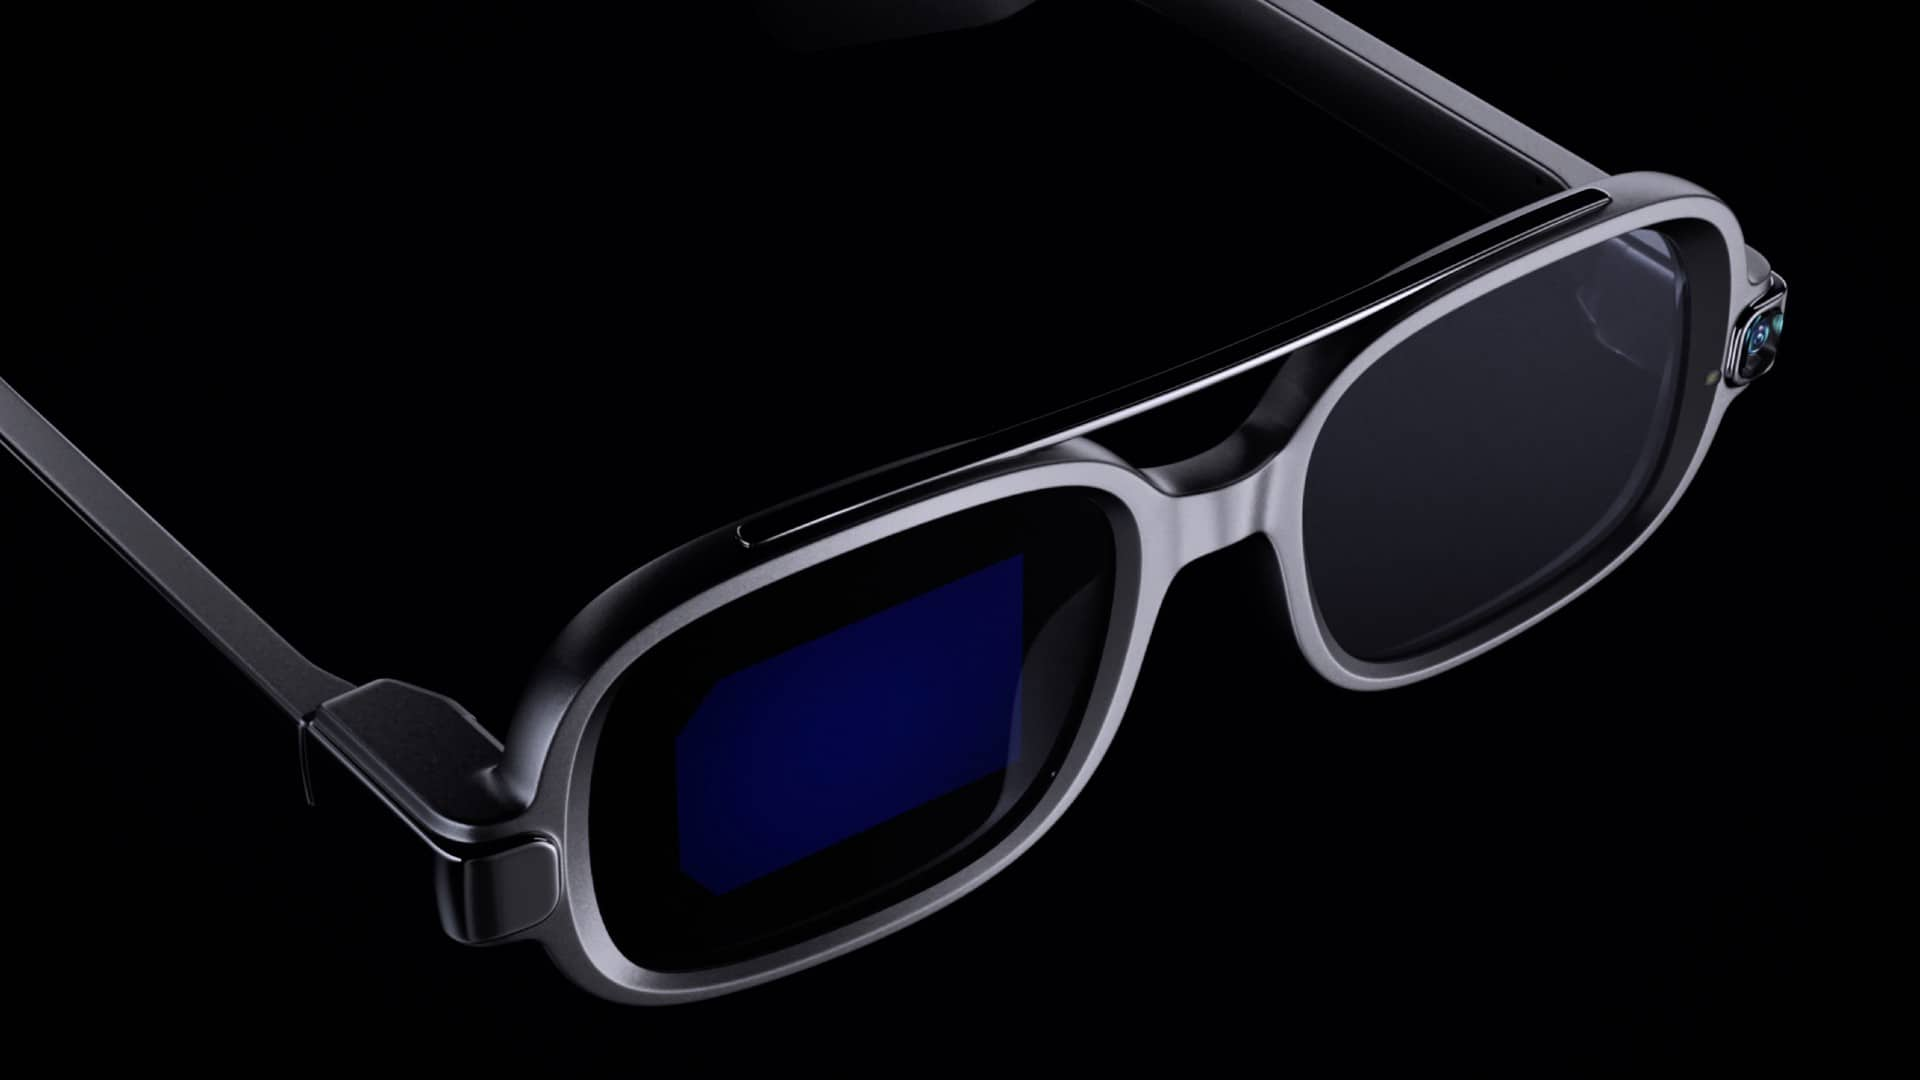 Die Xiaomi Smart Glasses